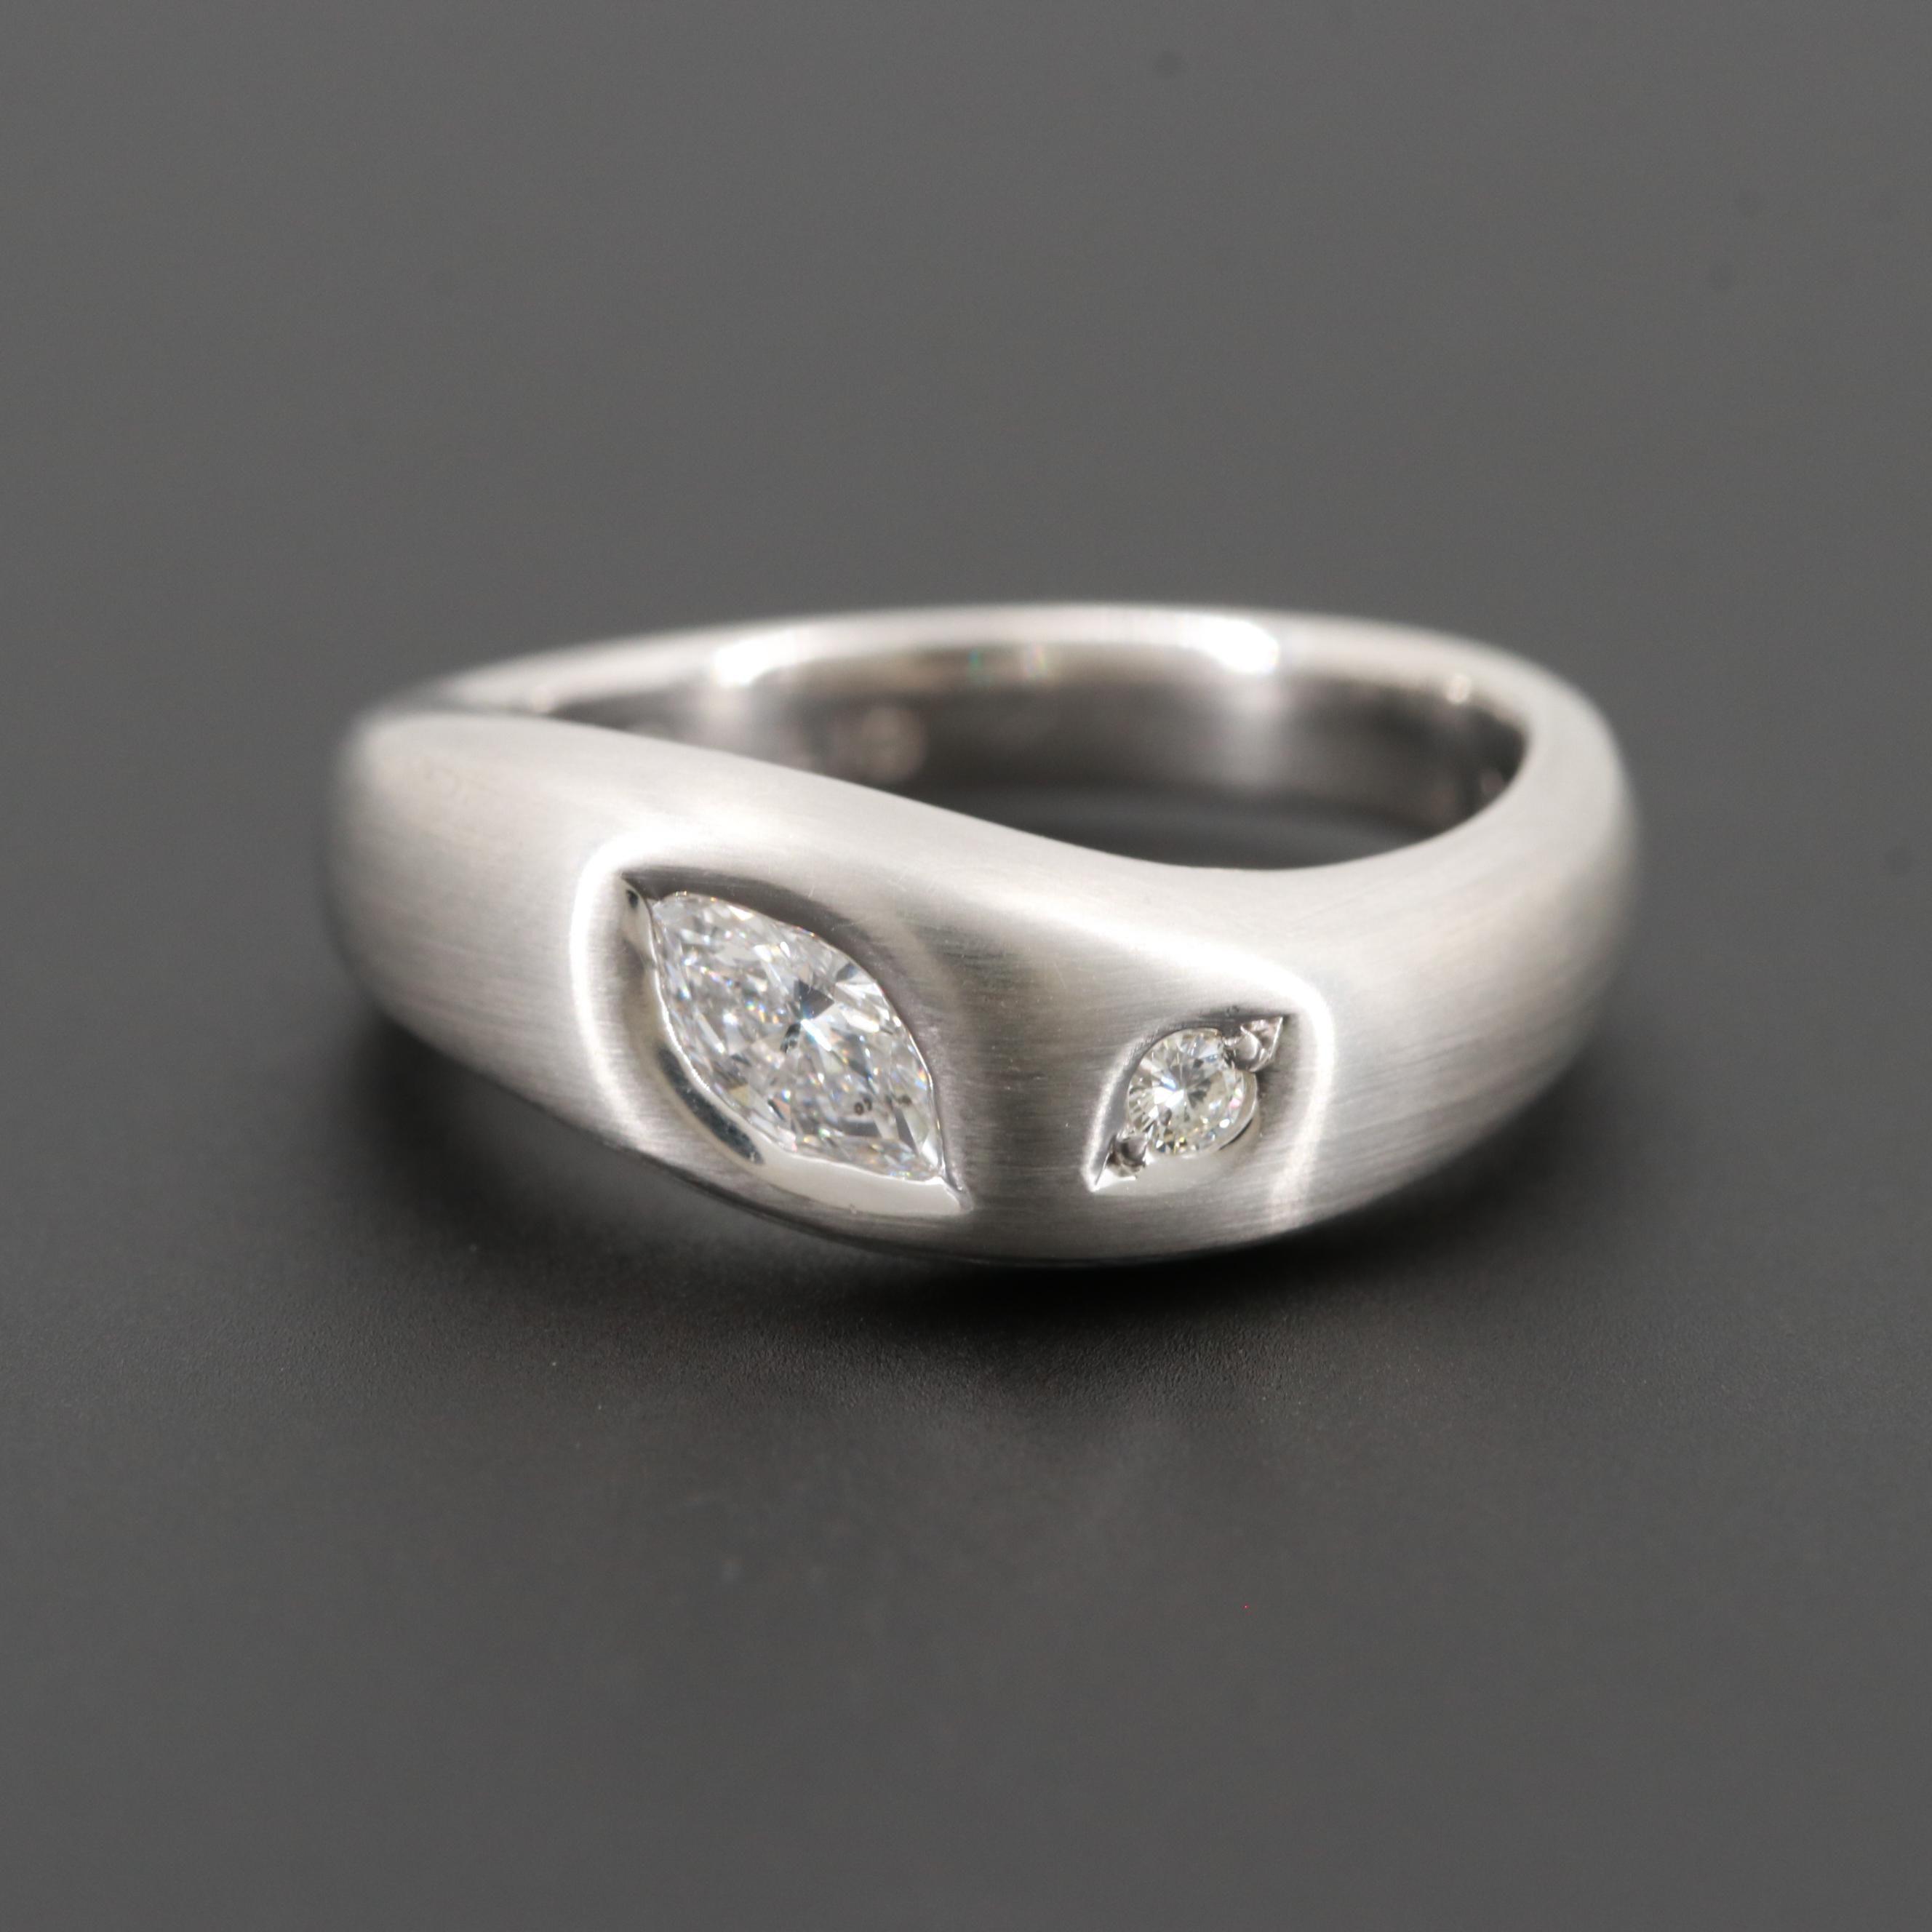 Platinum Diamond Contoured Ring with Satin Finish